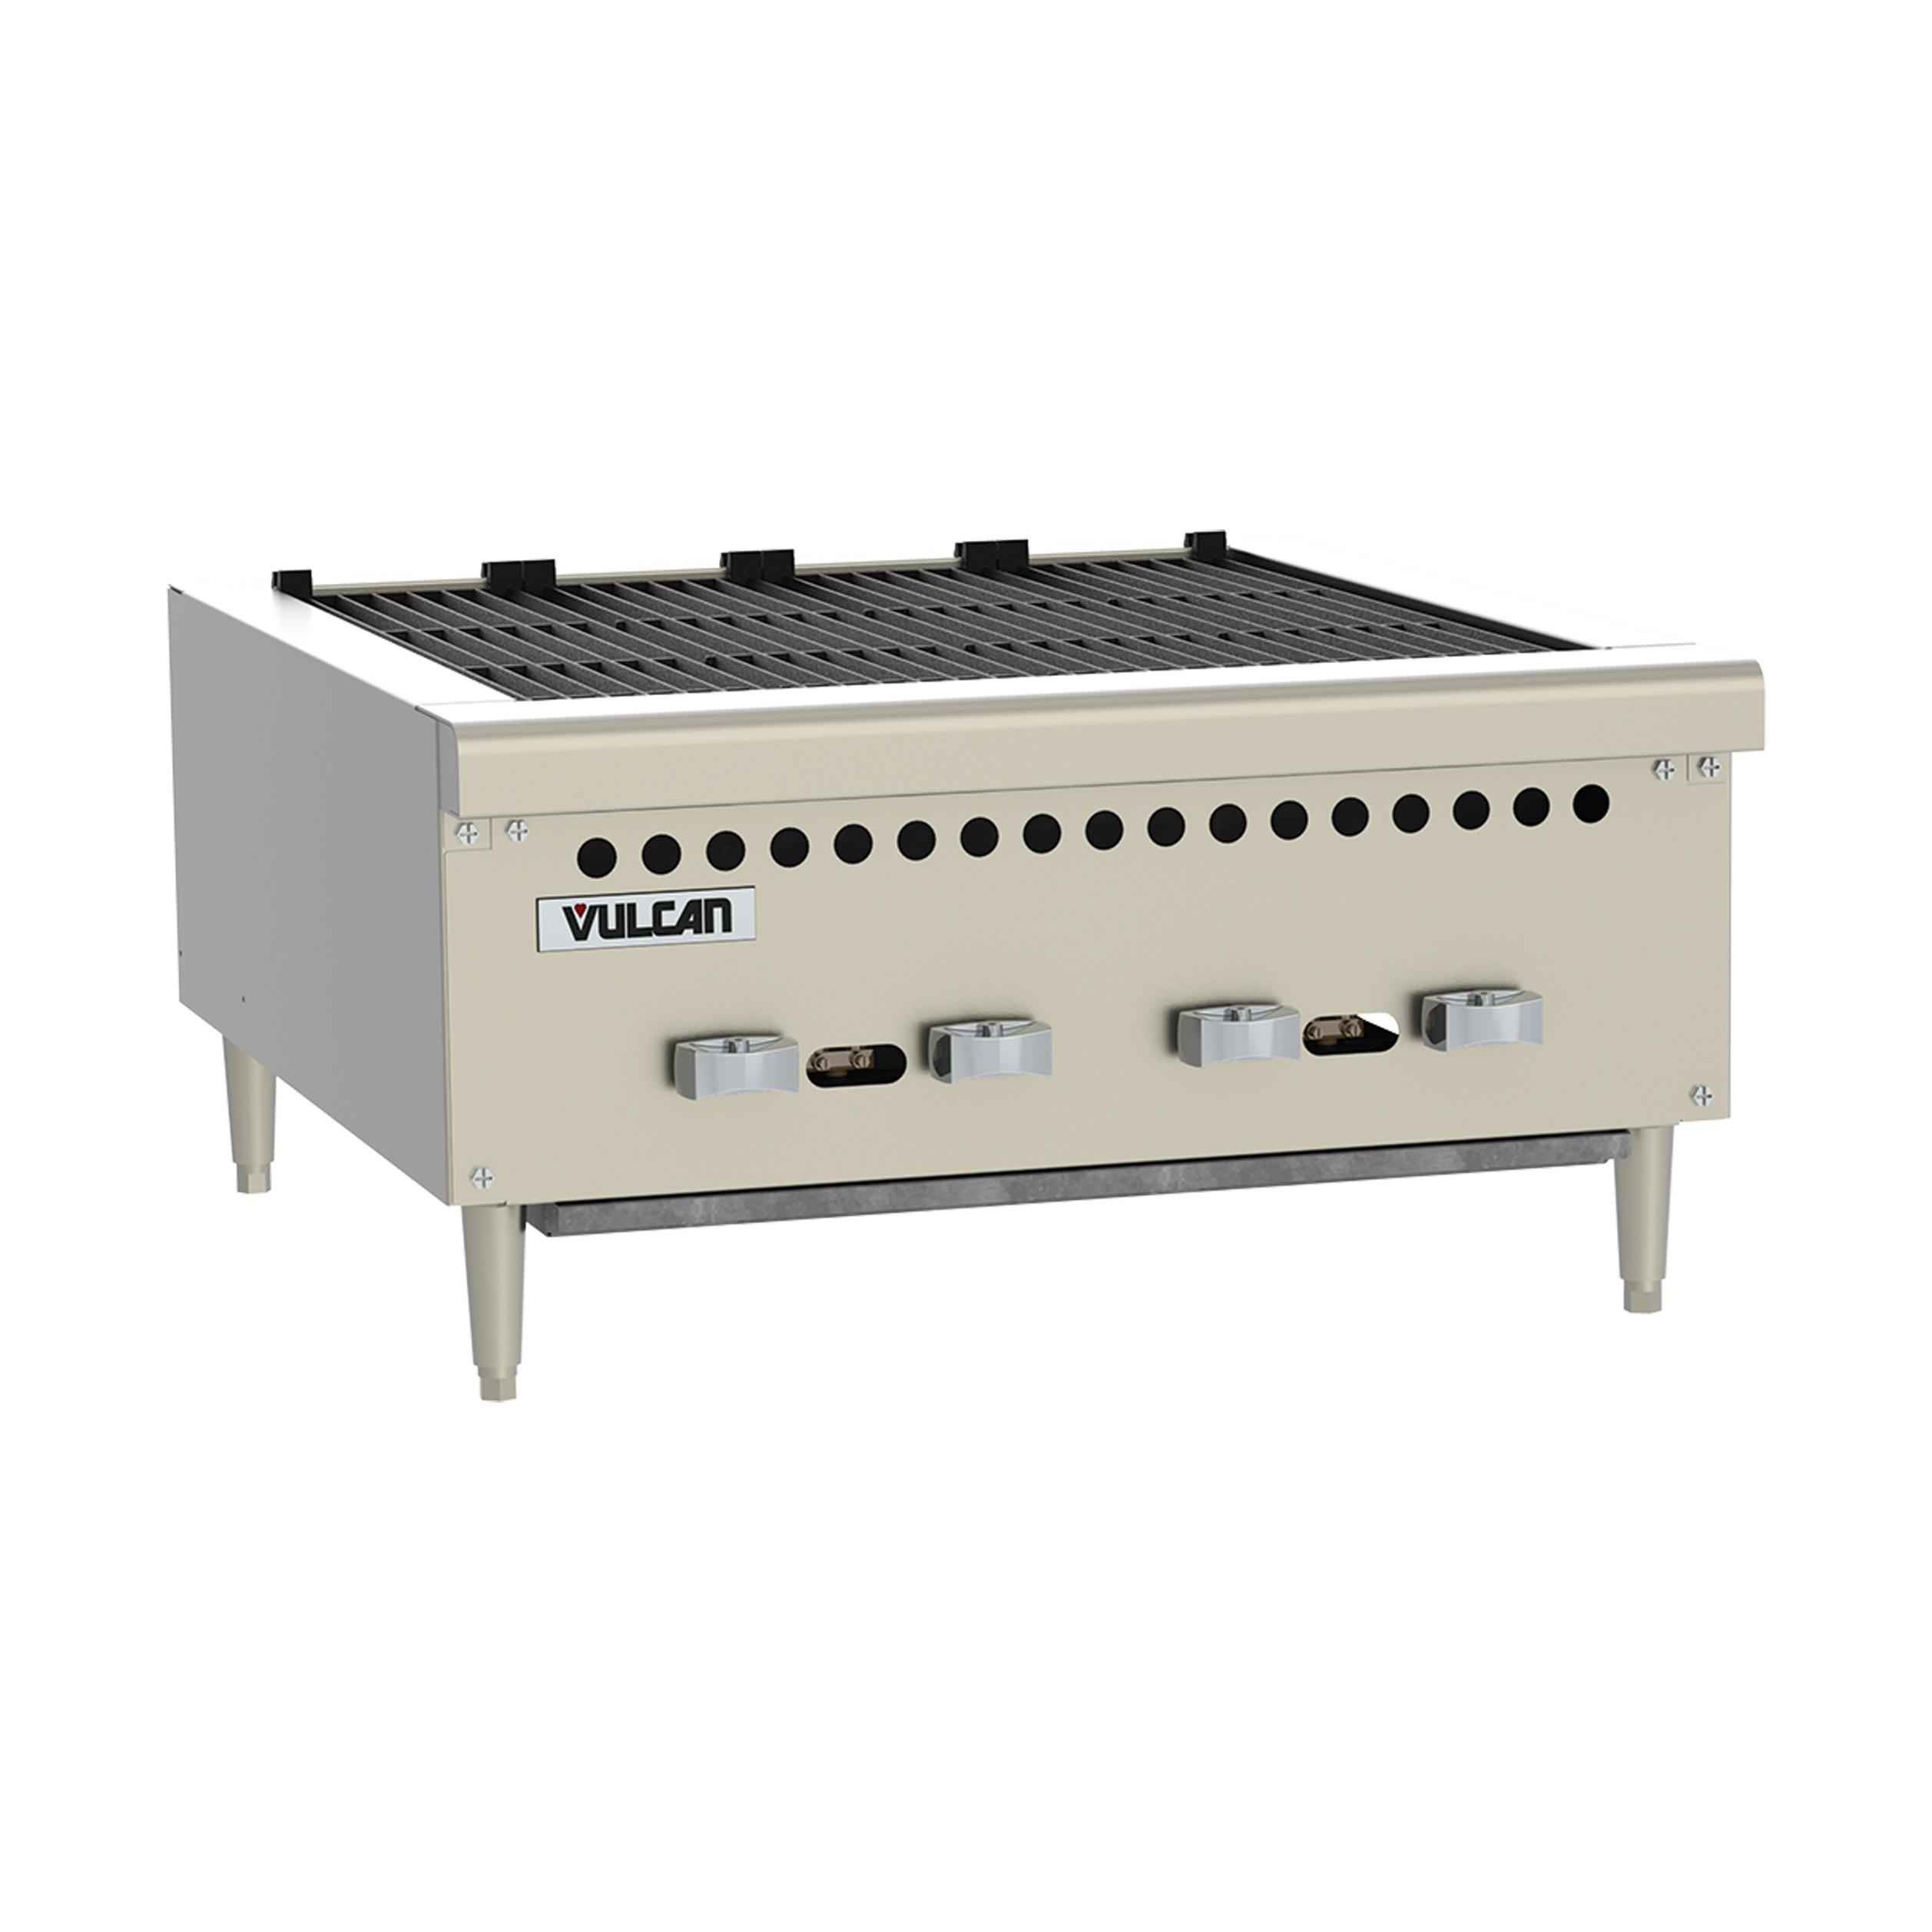 Vulcan VCRB25 charbroiler, gas, countertop